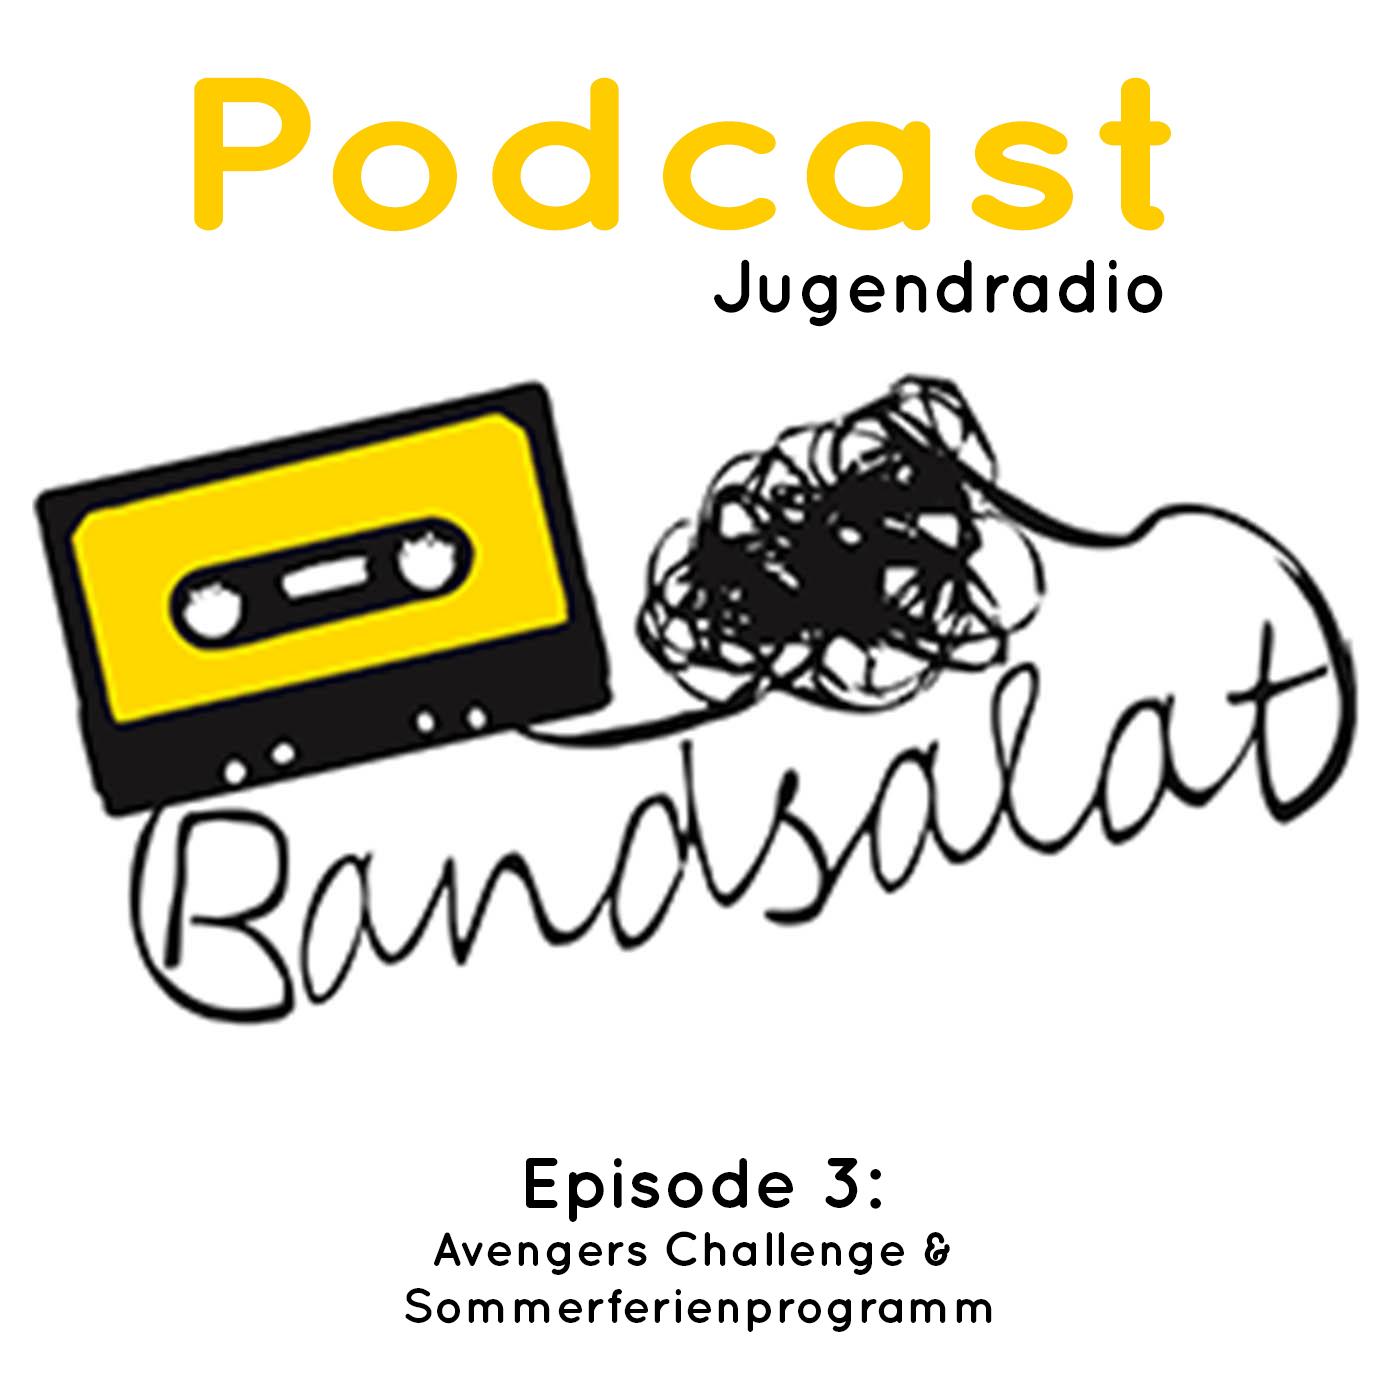 Jugendradio Bandsalat